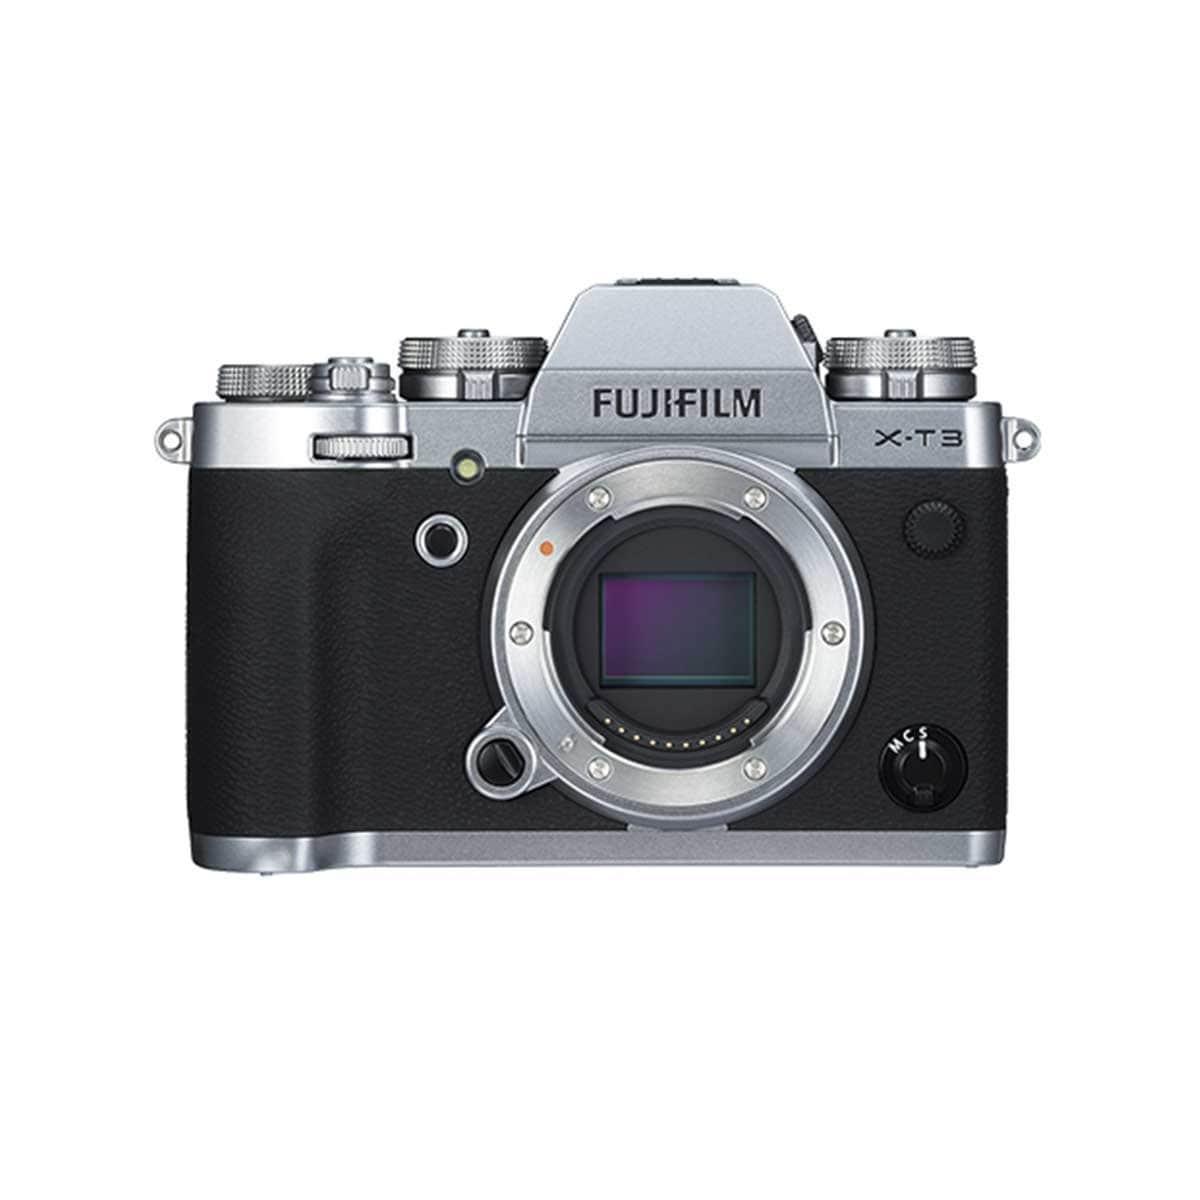 Cámara Fujifilm X-T3 Plata+ Xf18-55Mm